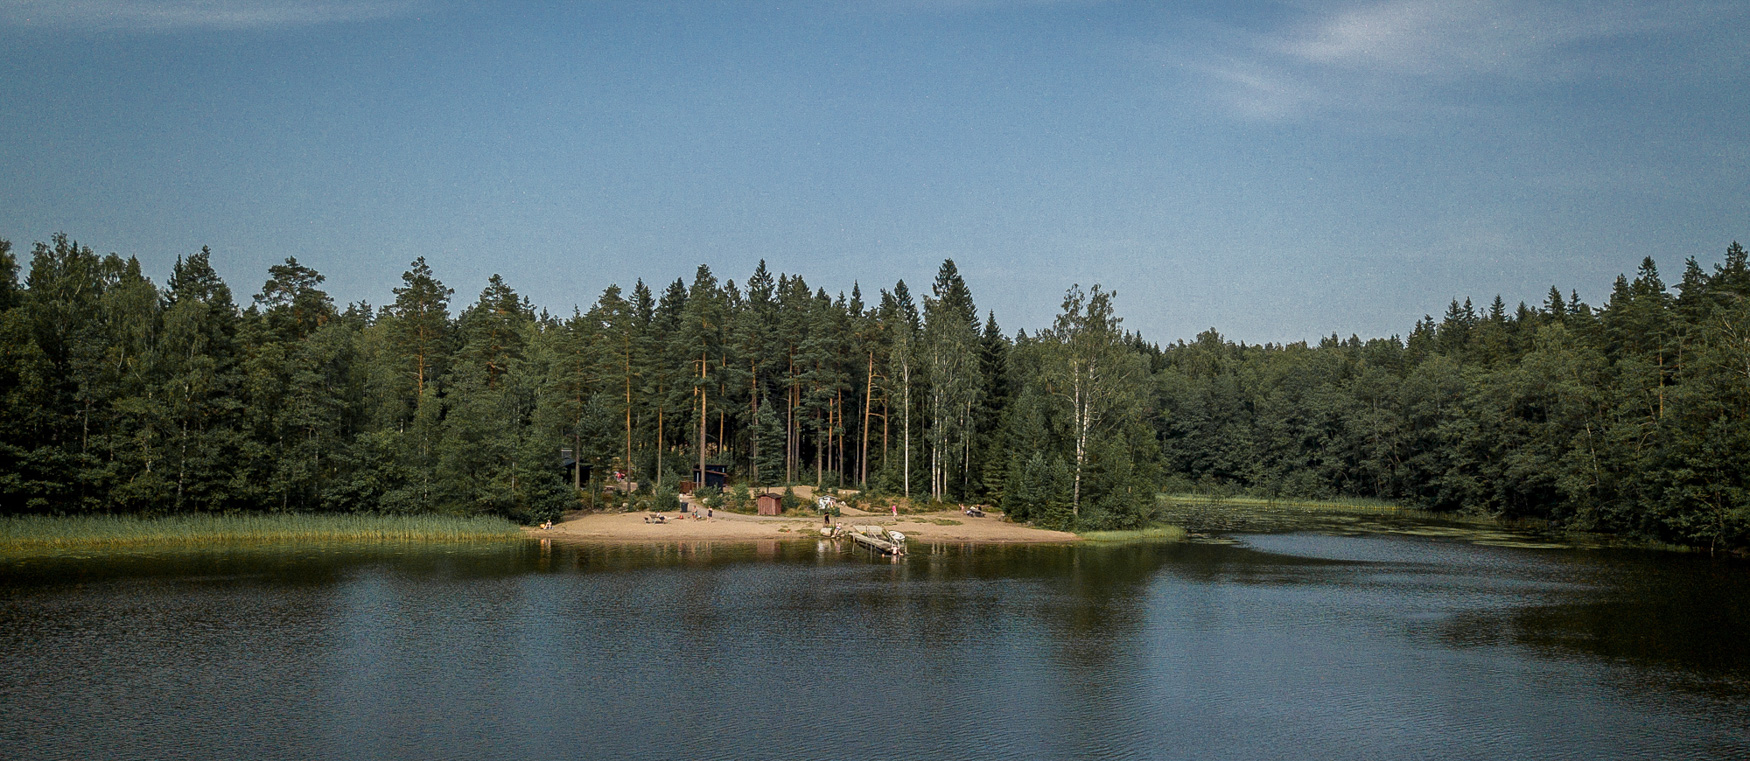 Raseborg Finnland See